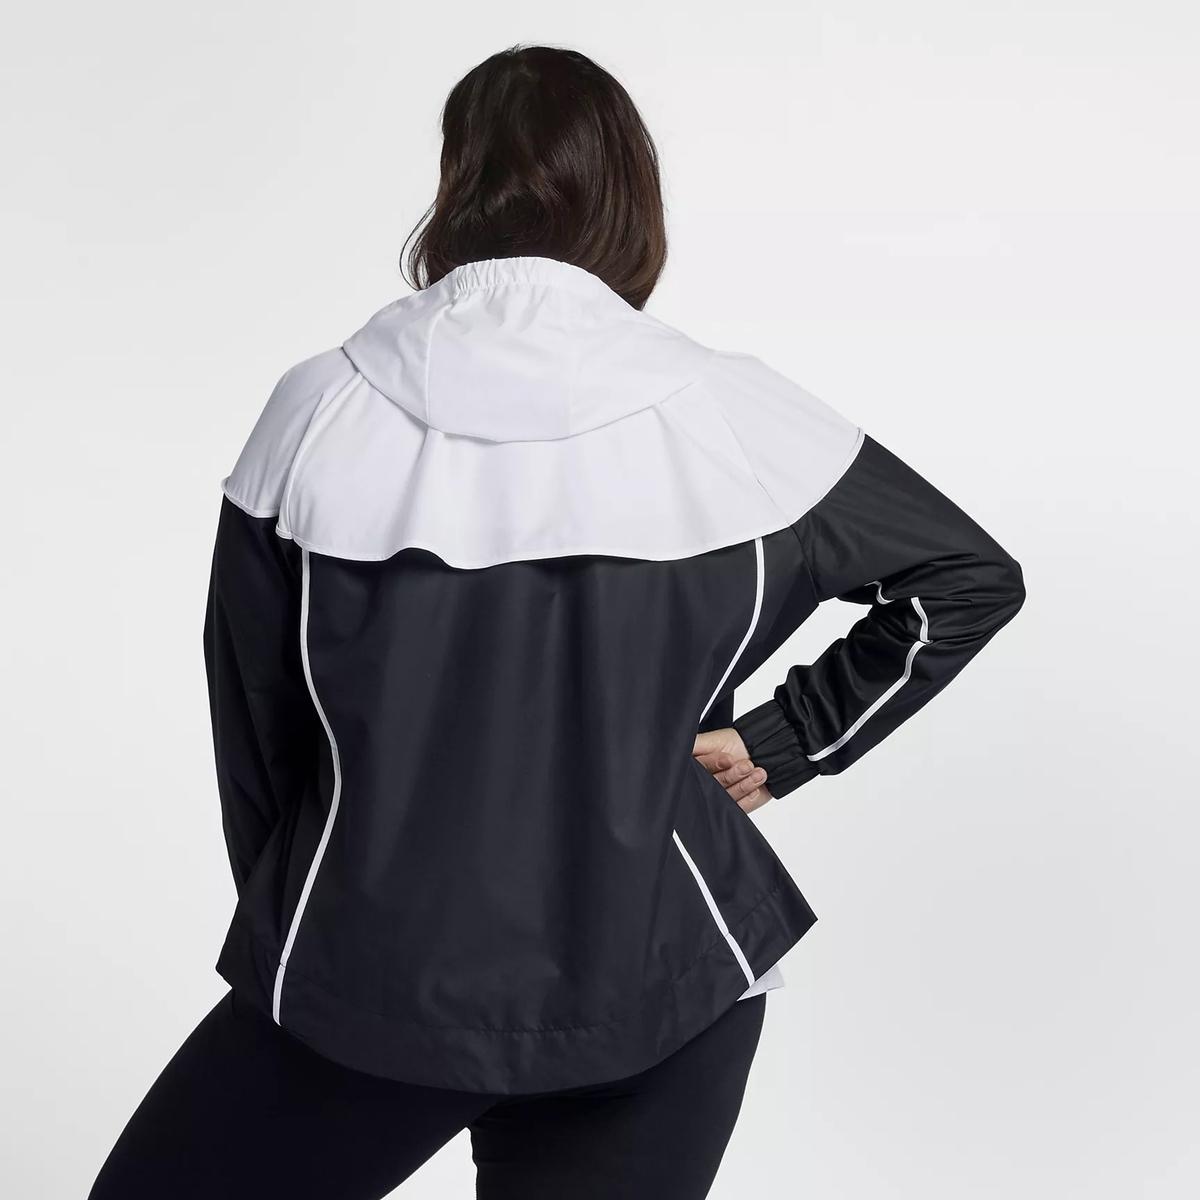 Imagen secundaria de producto de Chaqueta de corte recto - Nike